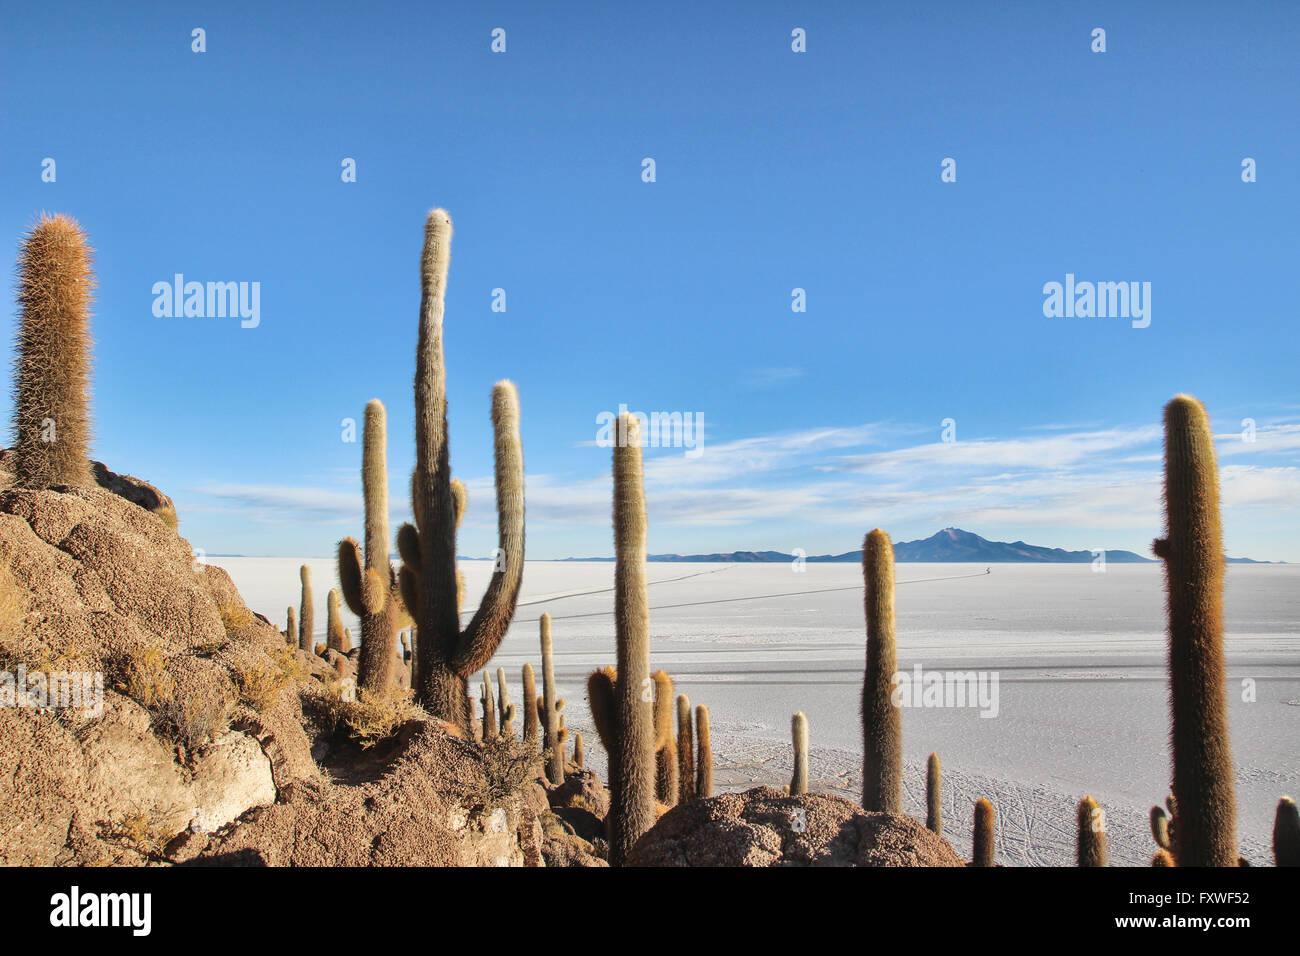 Bolivia - 22/08/2013 - Bolivia / Salar de Uyuni / Uyuni - desierto de sal de Uyuni, Isla del Pescado - Sandrine Imagen De Stock